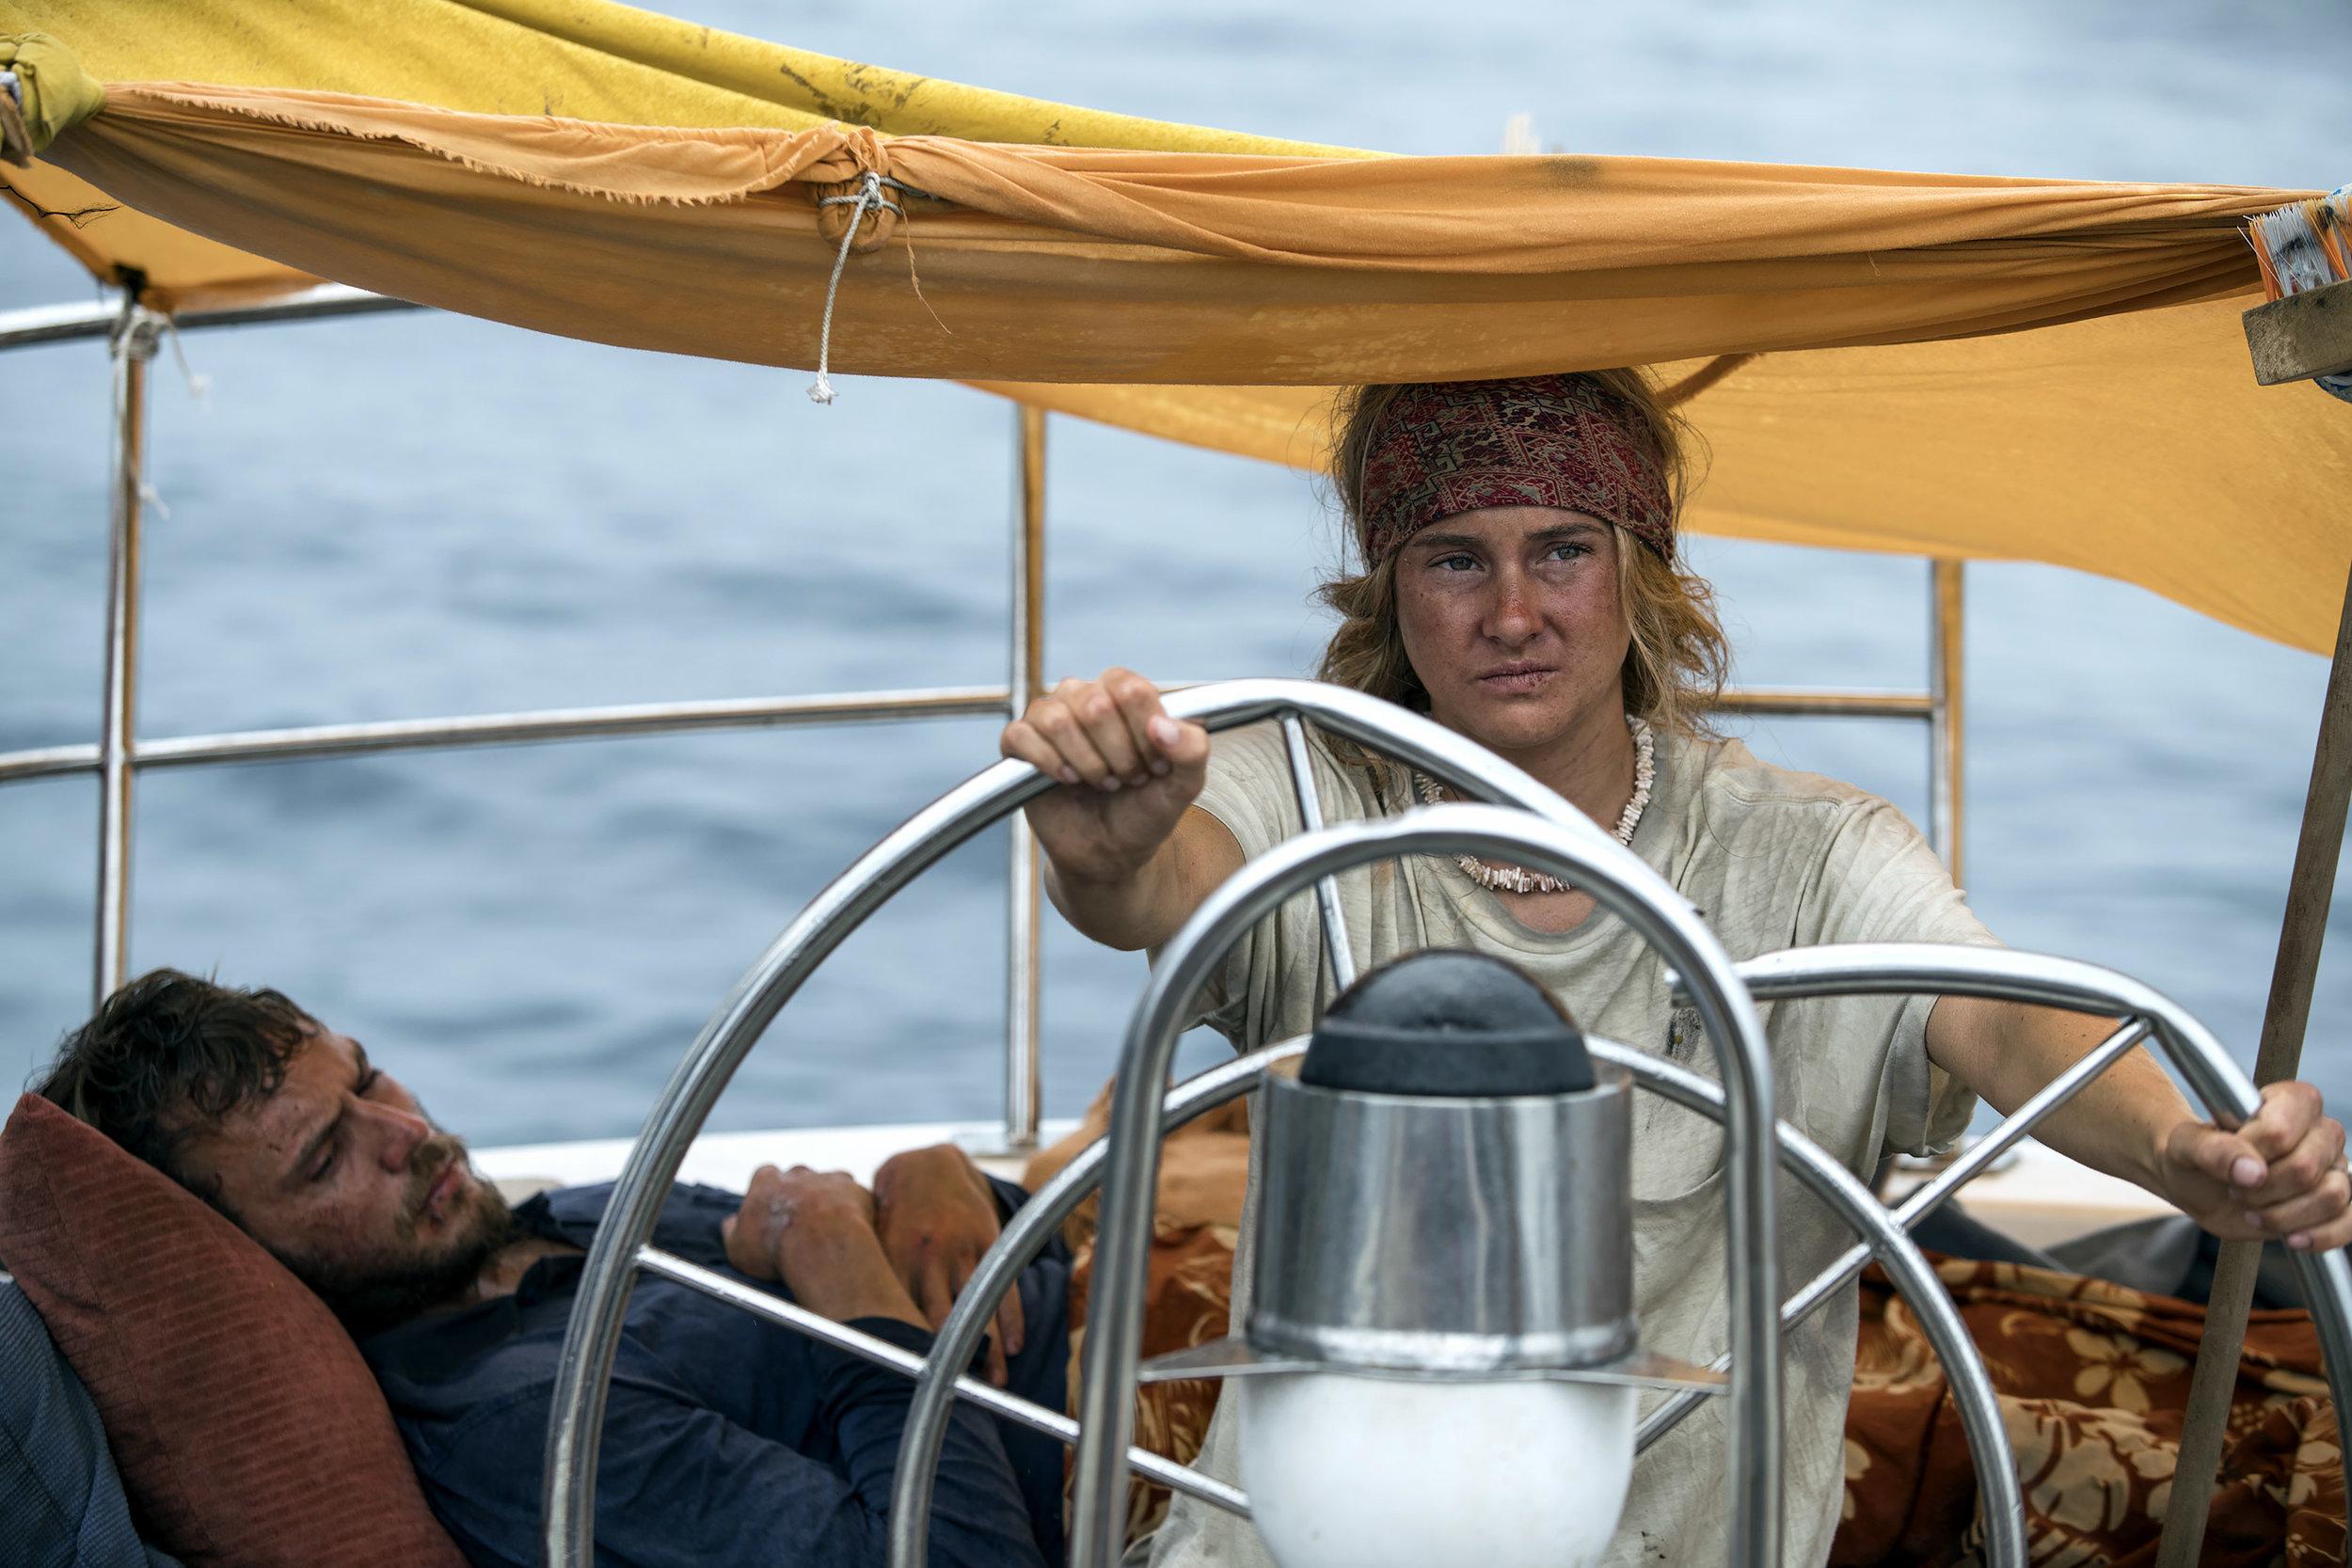 Sam Claflin and Shailene Woodley star in ADRIFTCourtesy of STXfilms